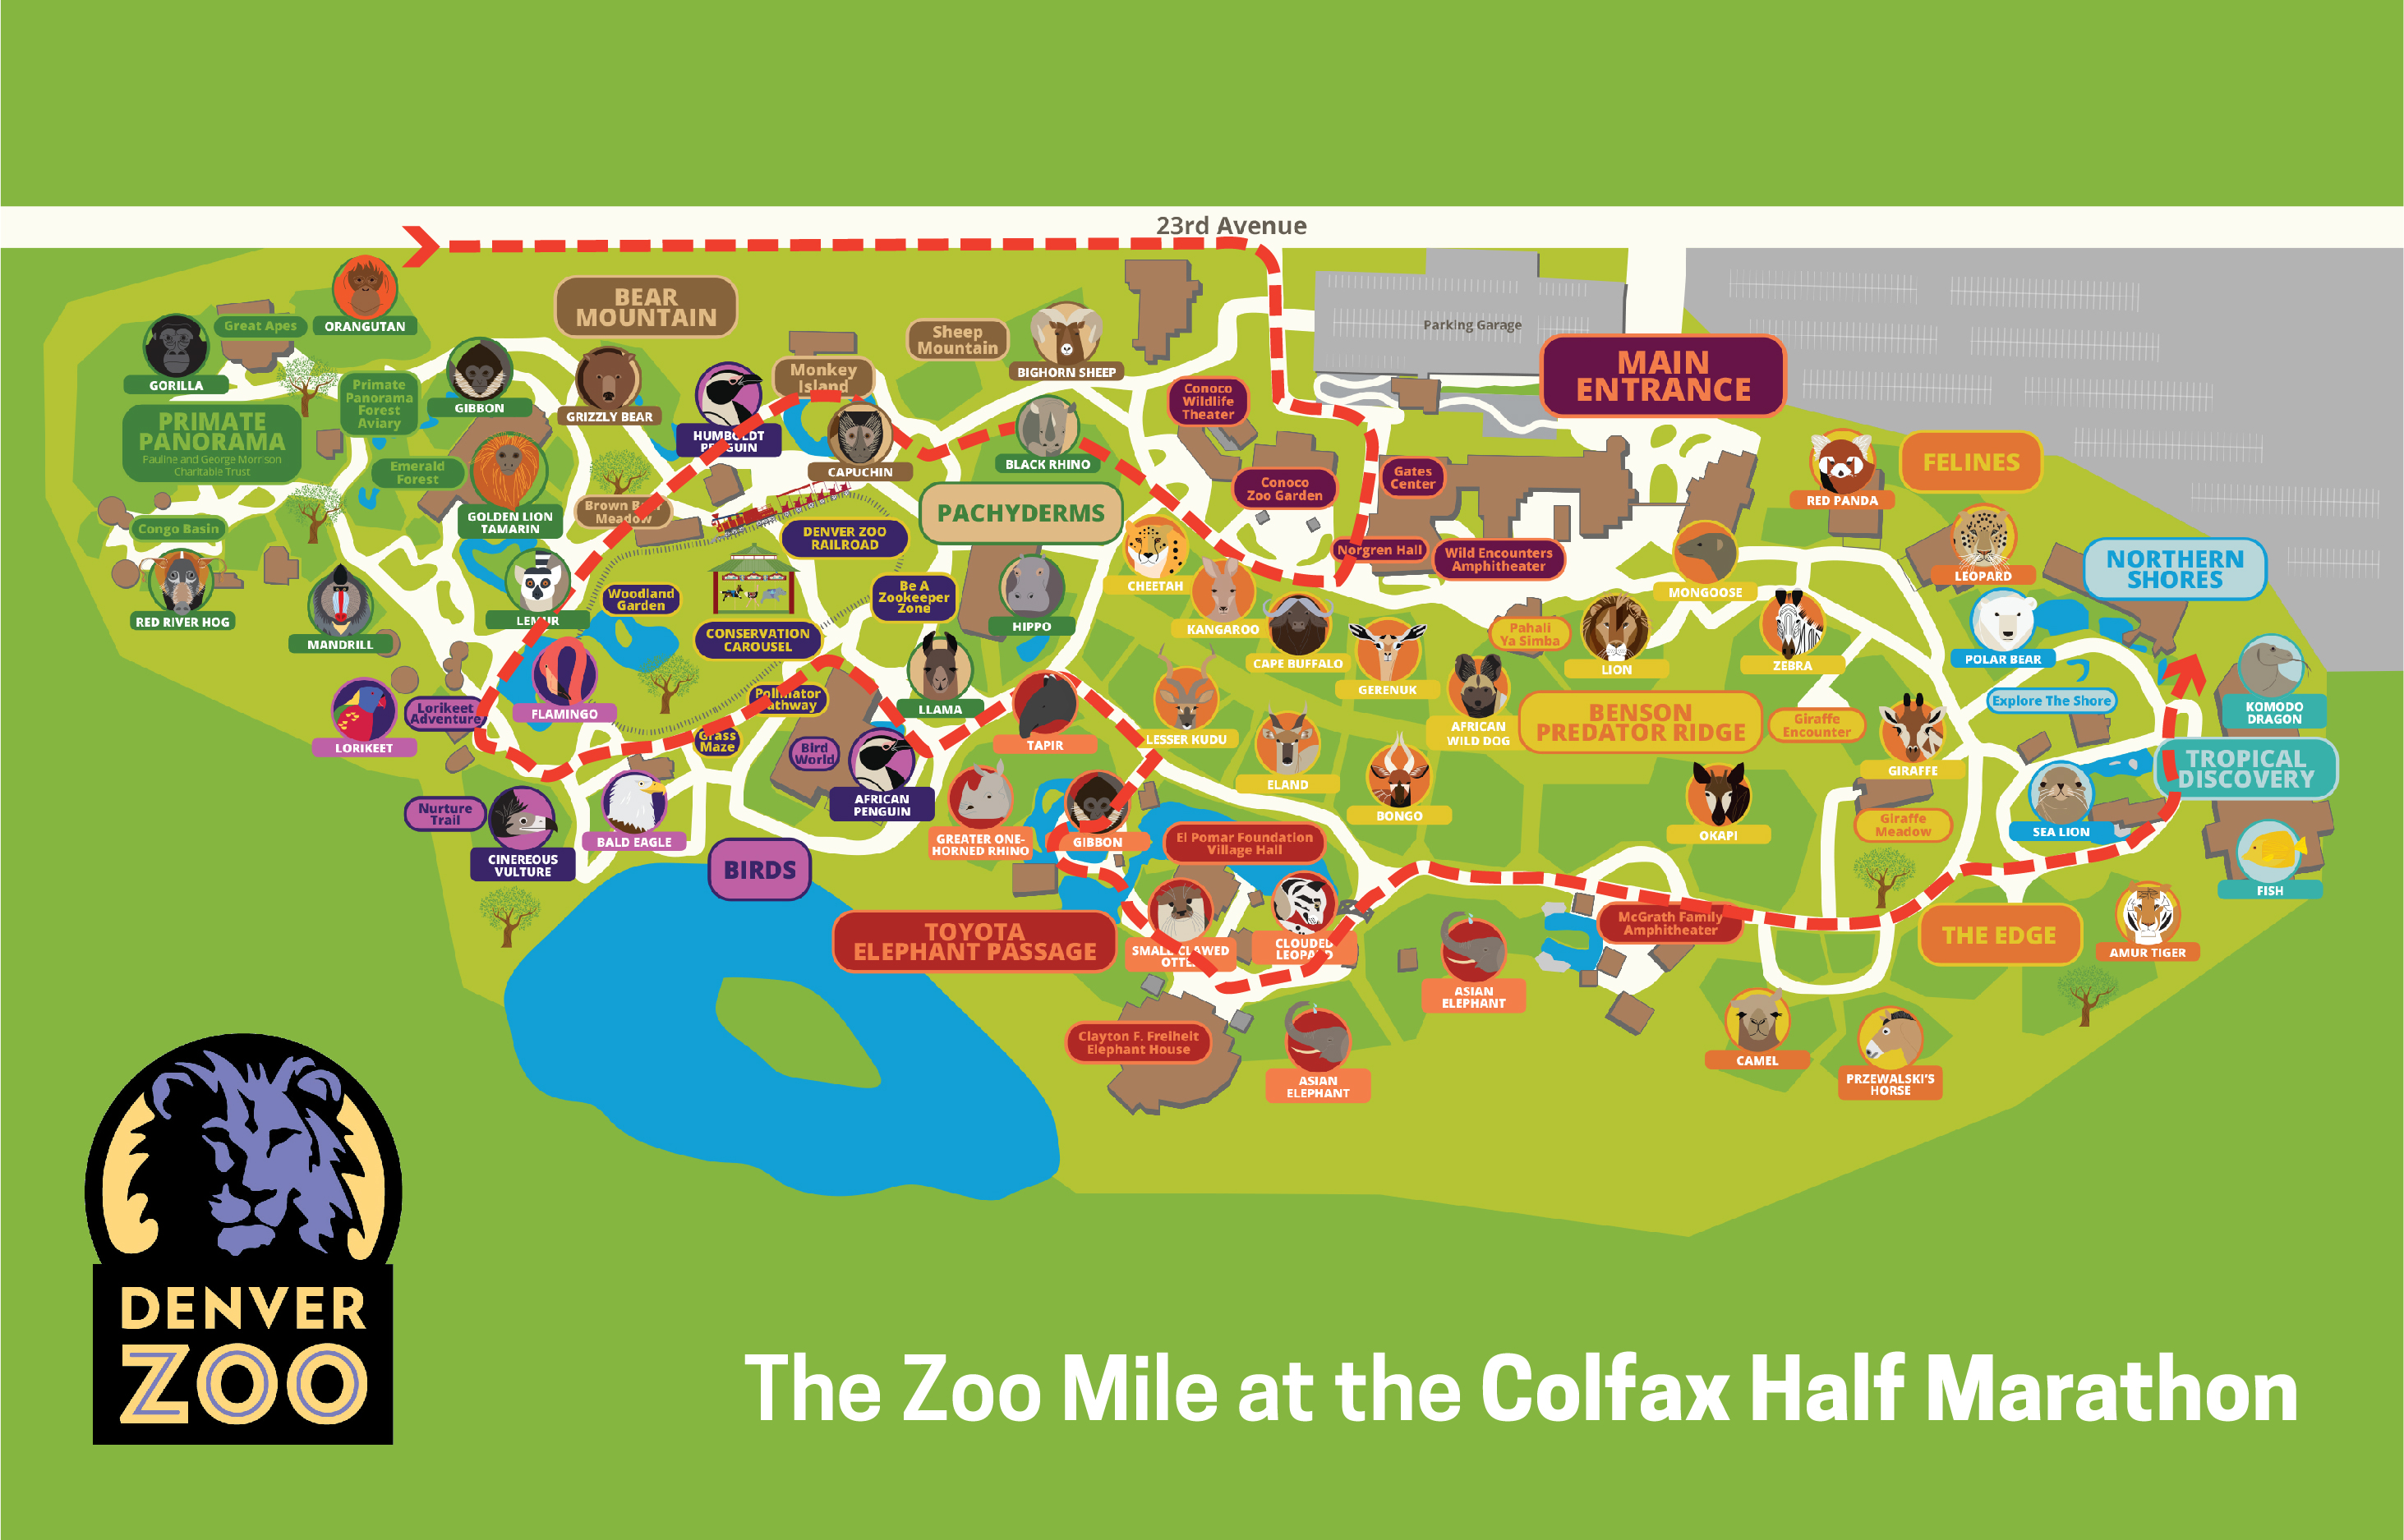 denver zoo map